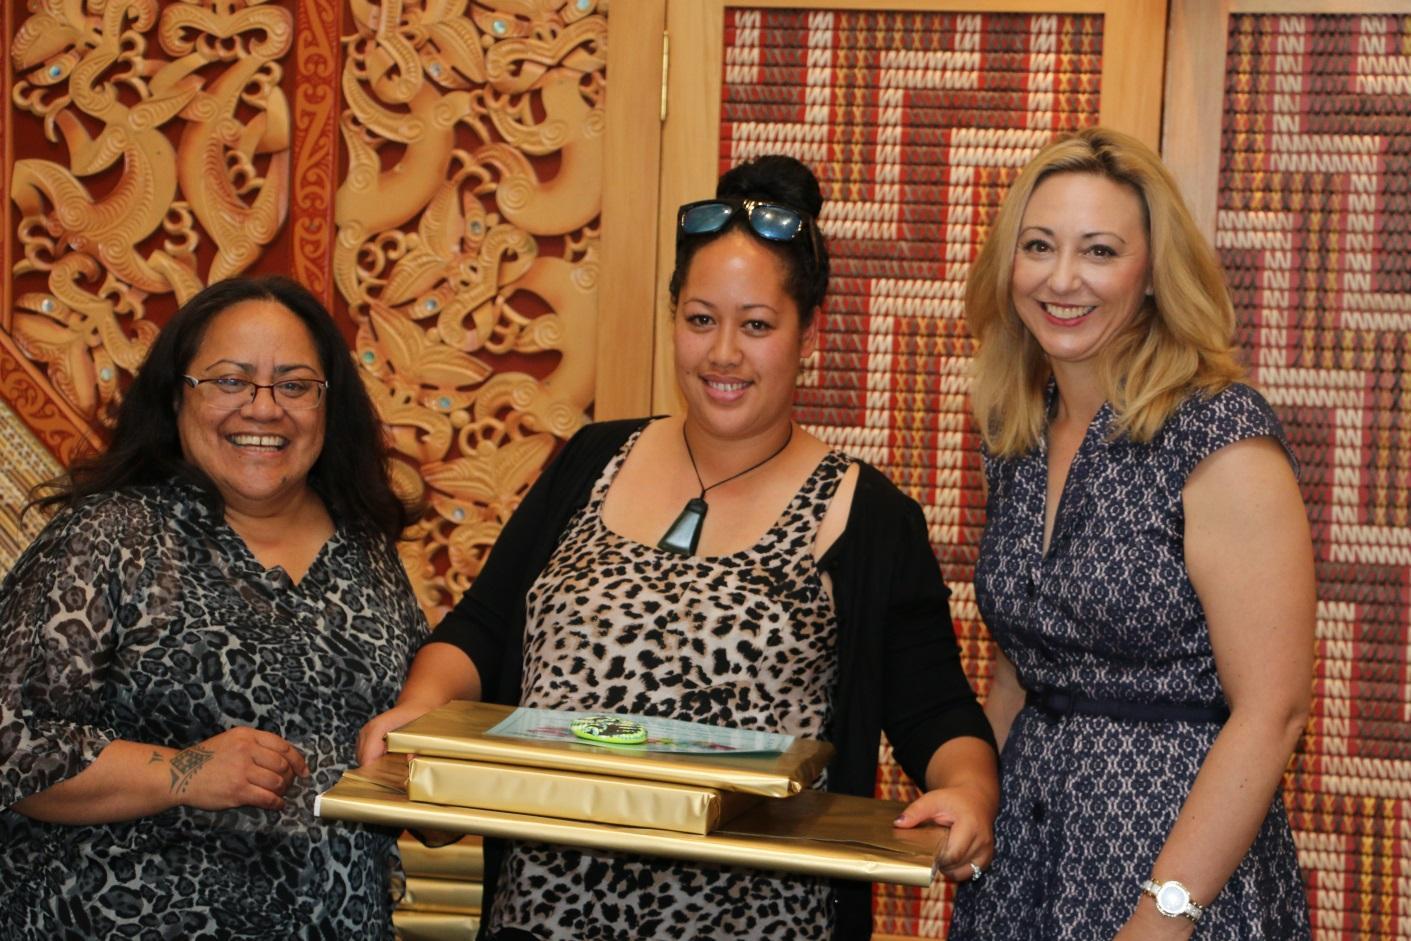 Maire Kipa, our Te Pūtahitanga o Te Waipounamu Navigator Coordinator, with Leigh Wickliffe, who was a graduate of the programme and Sarah Dowie, the National MP for Invercargill